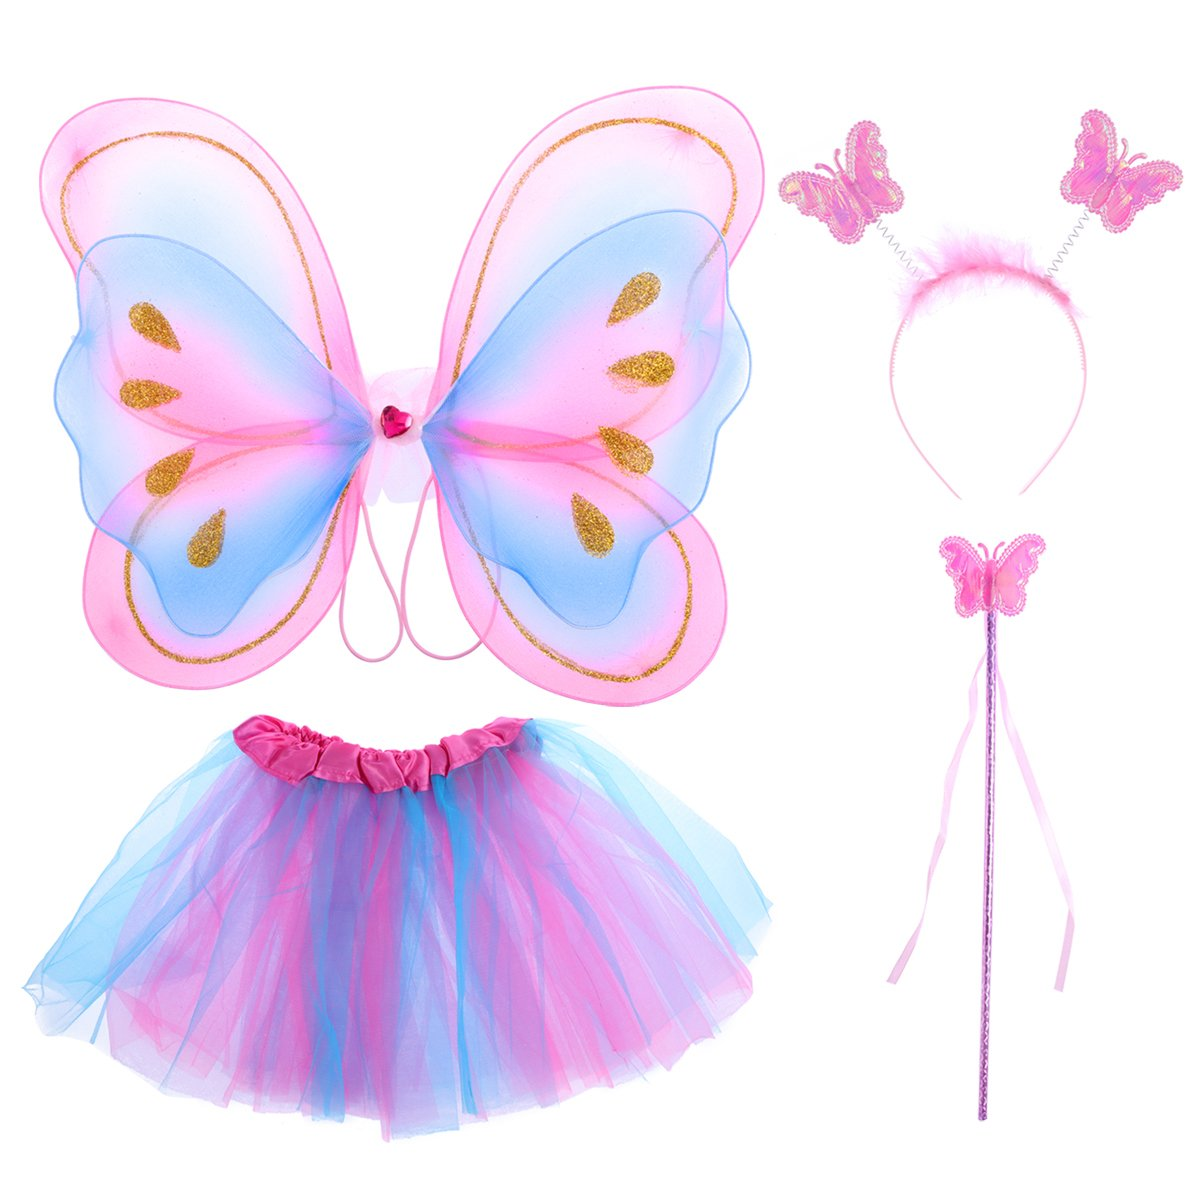 Tinksky 4pcs niños princesa de hadas mariposa ala varita diadema falda tutú fiesta traje de regalo de navidad